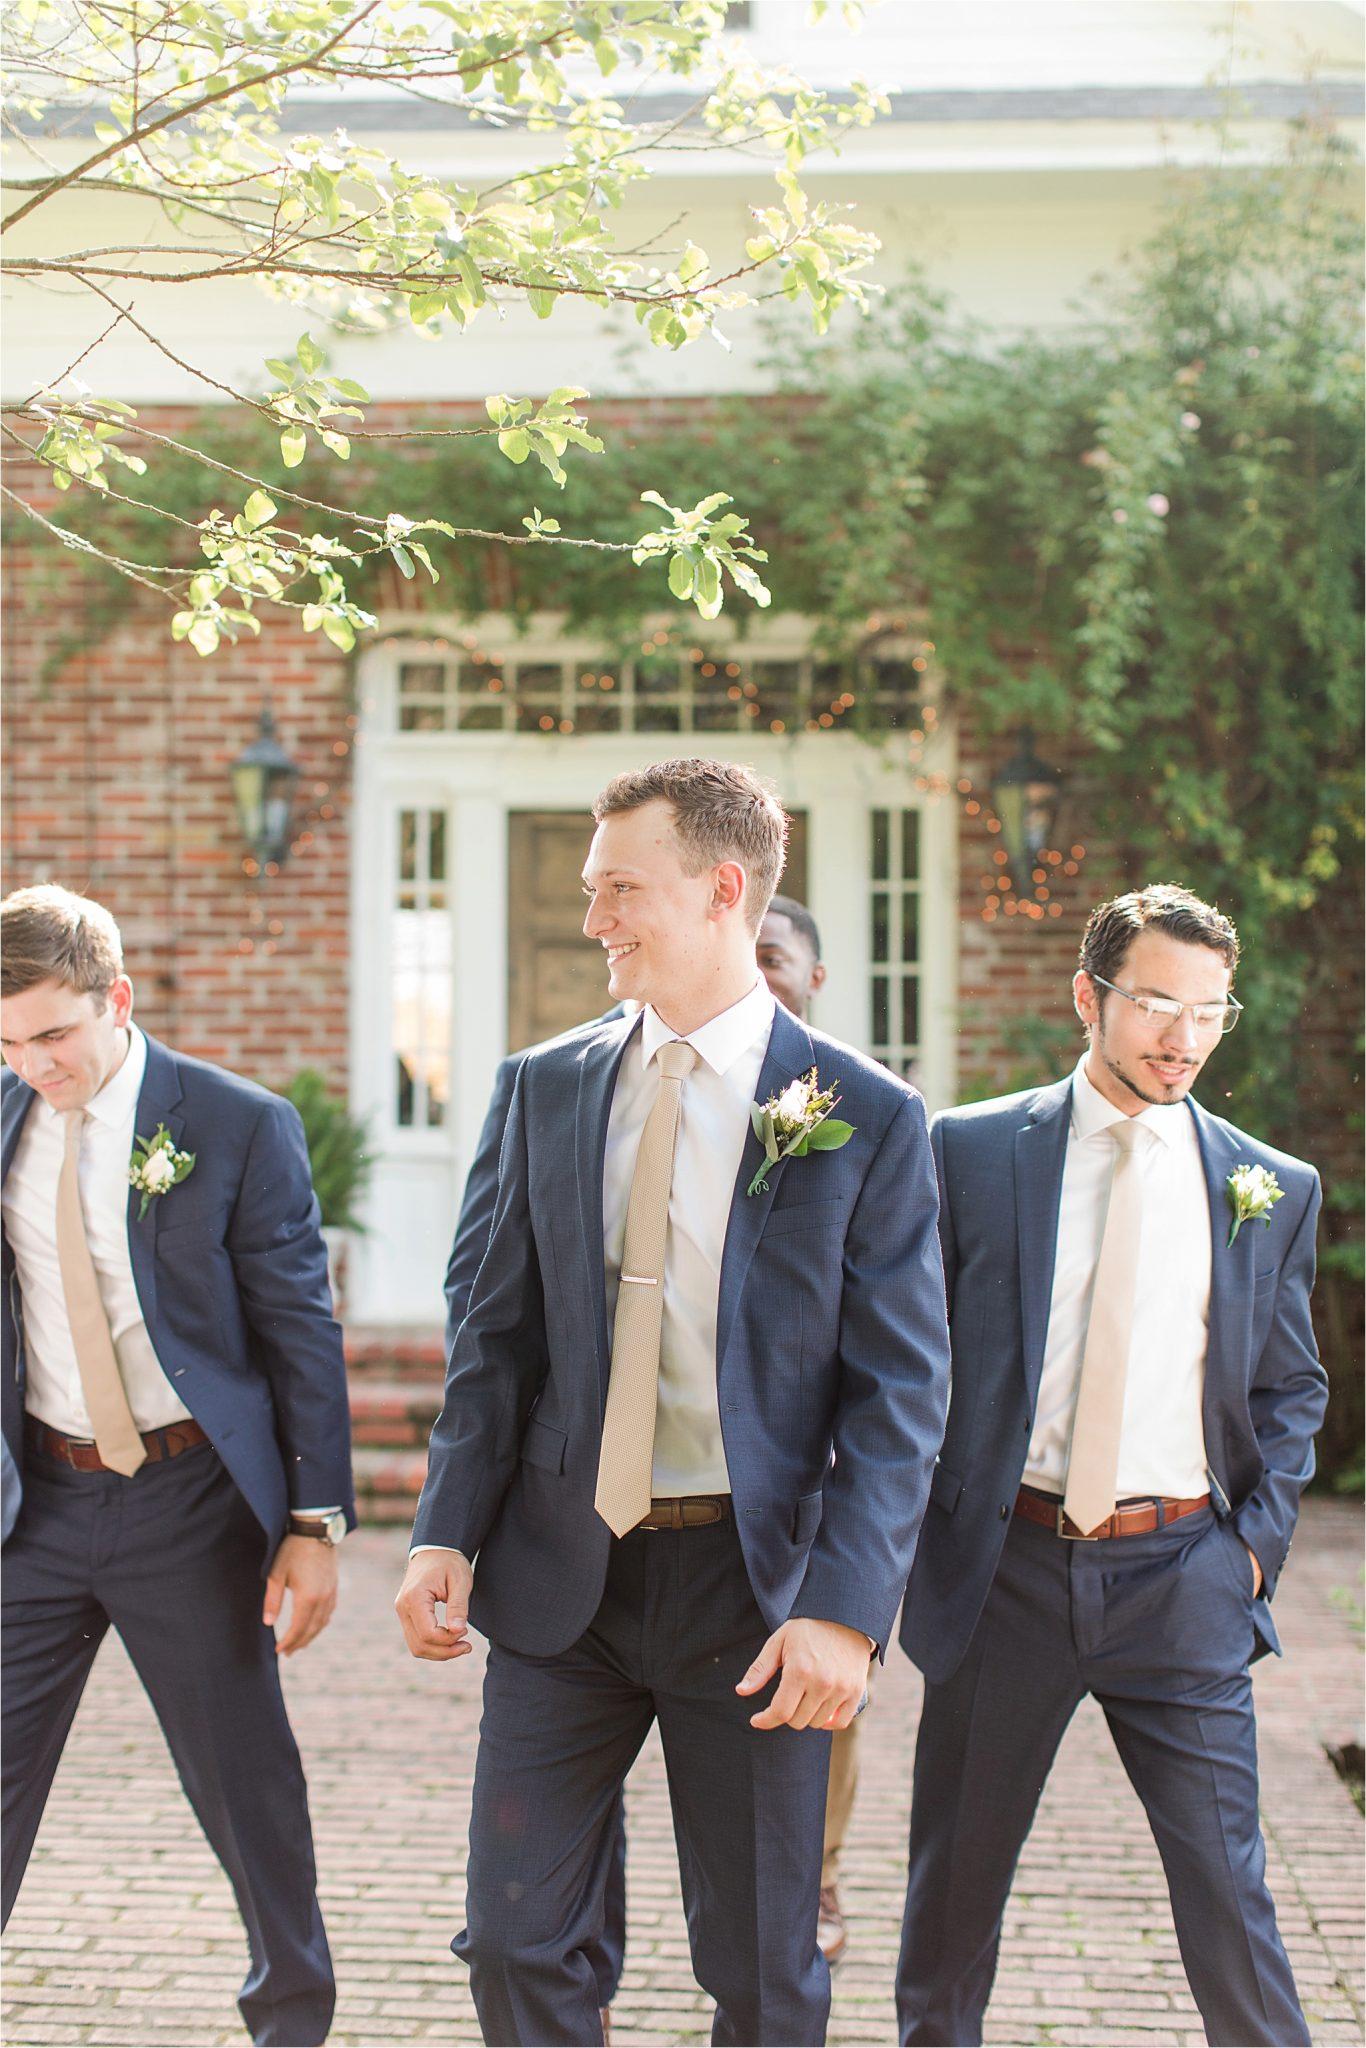 Hedge Farm Wedding, Alabama Wedding Photographer, Barn Wedding, Grooms and groomsmen, navy